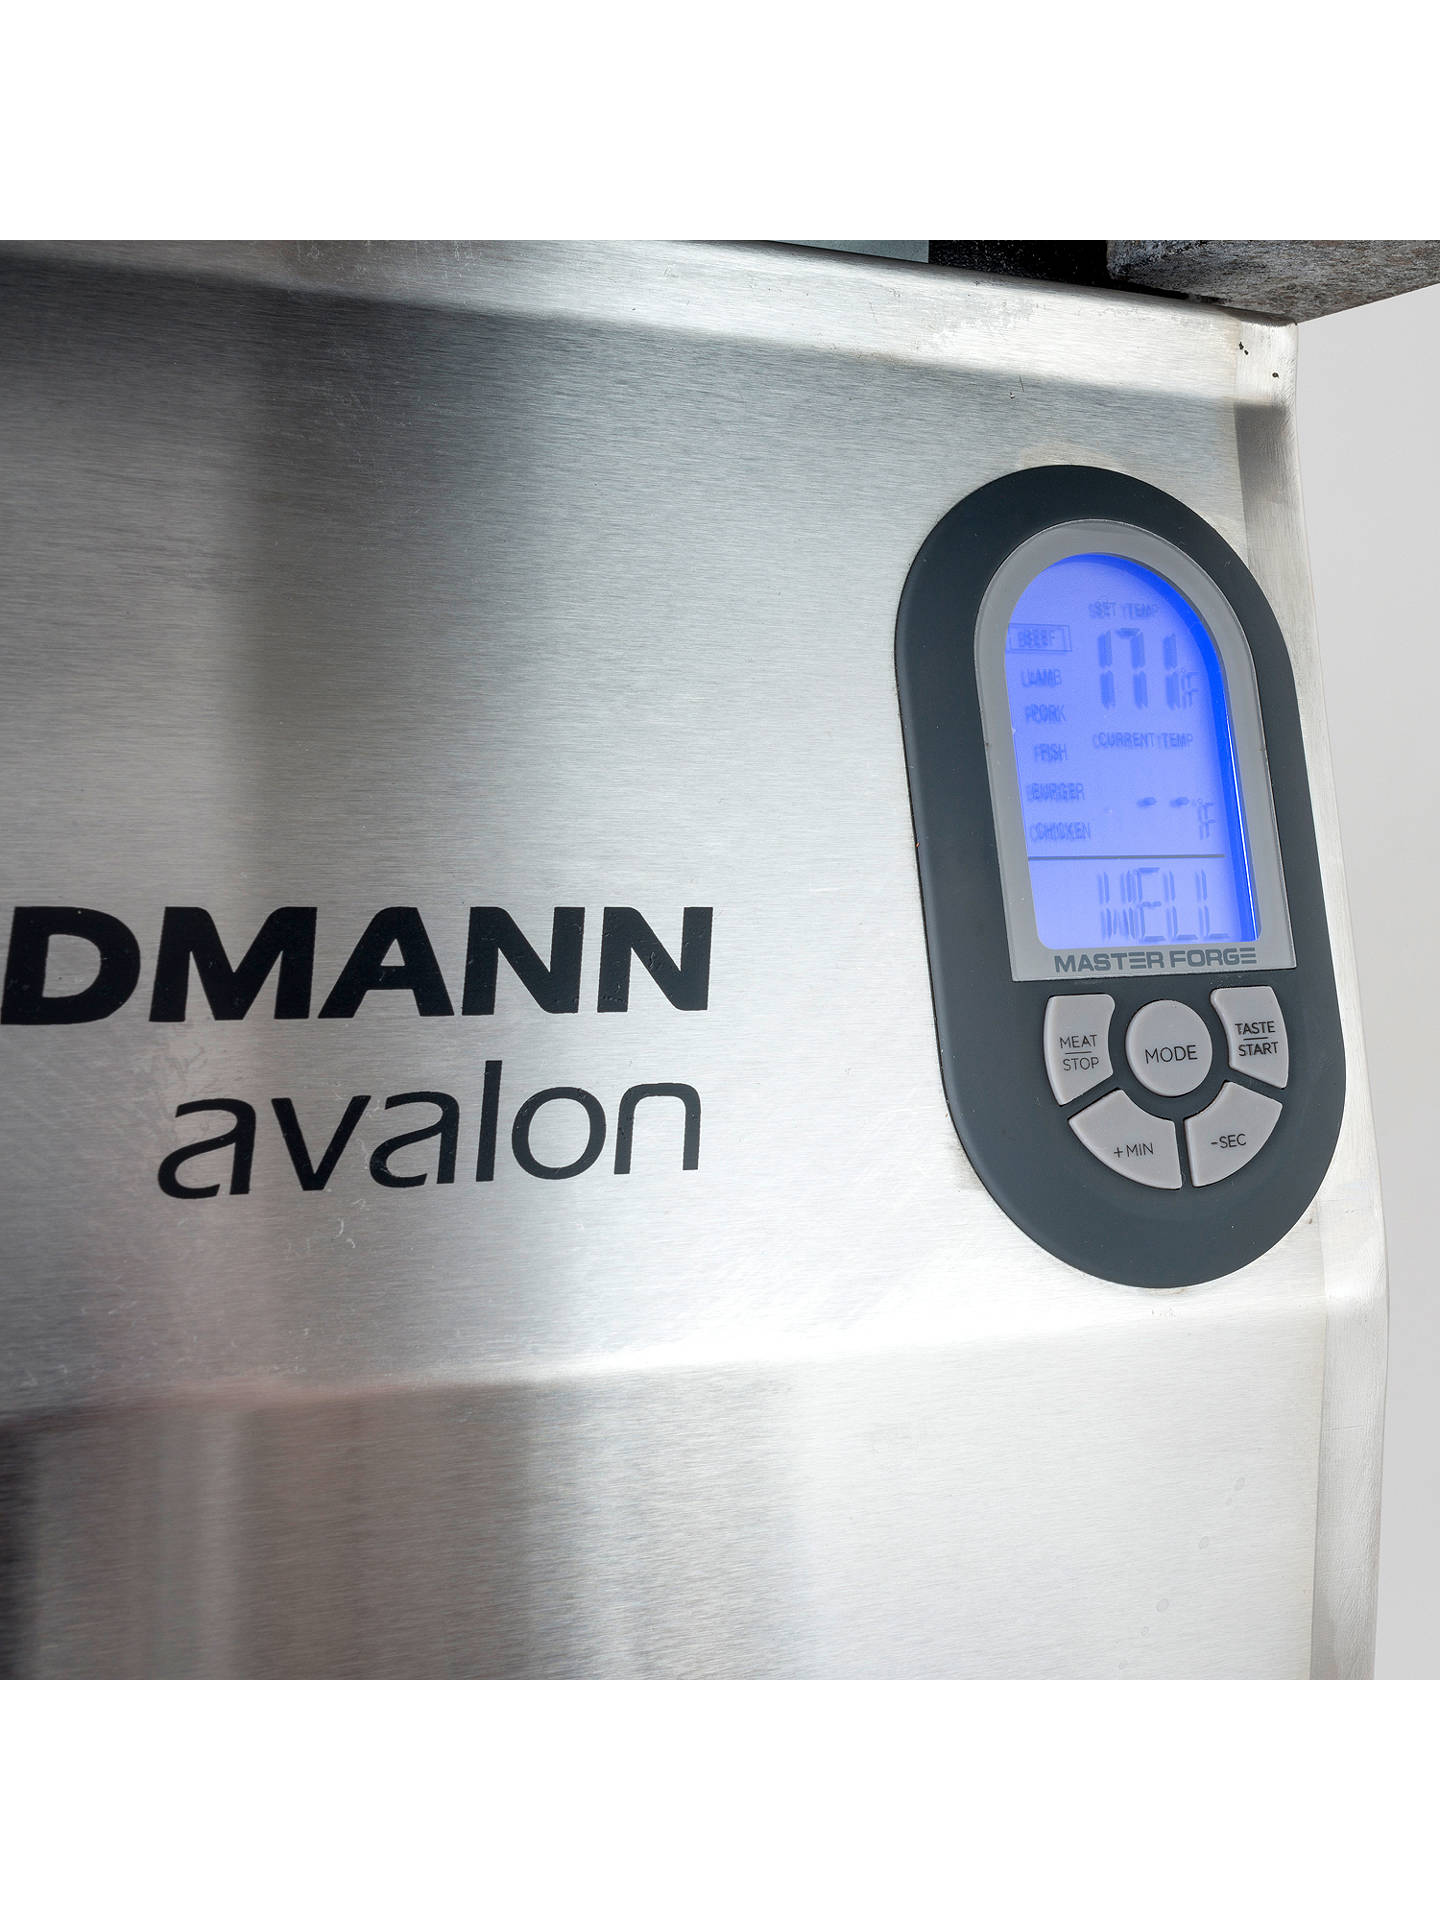 Landmann Avalon 5 1 Gas Burner BBQ at John Lewis & Partners